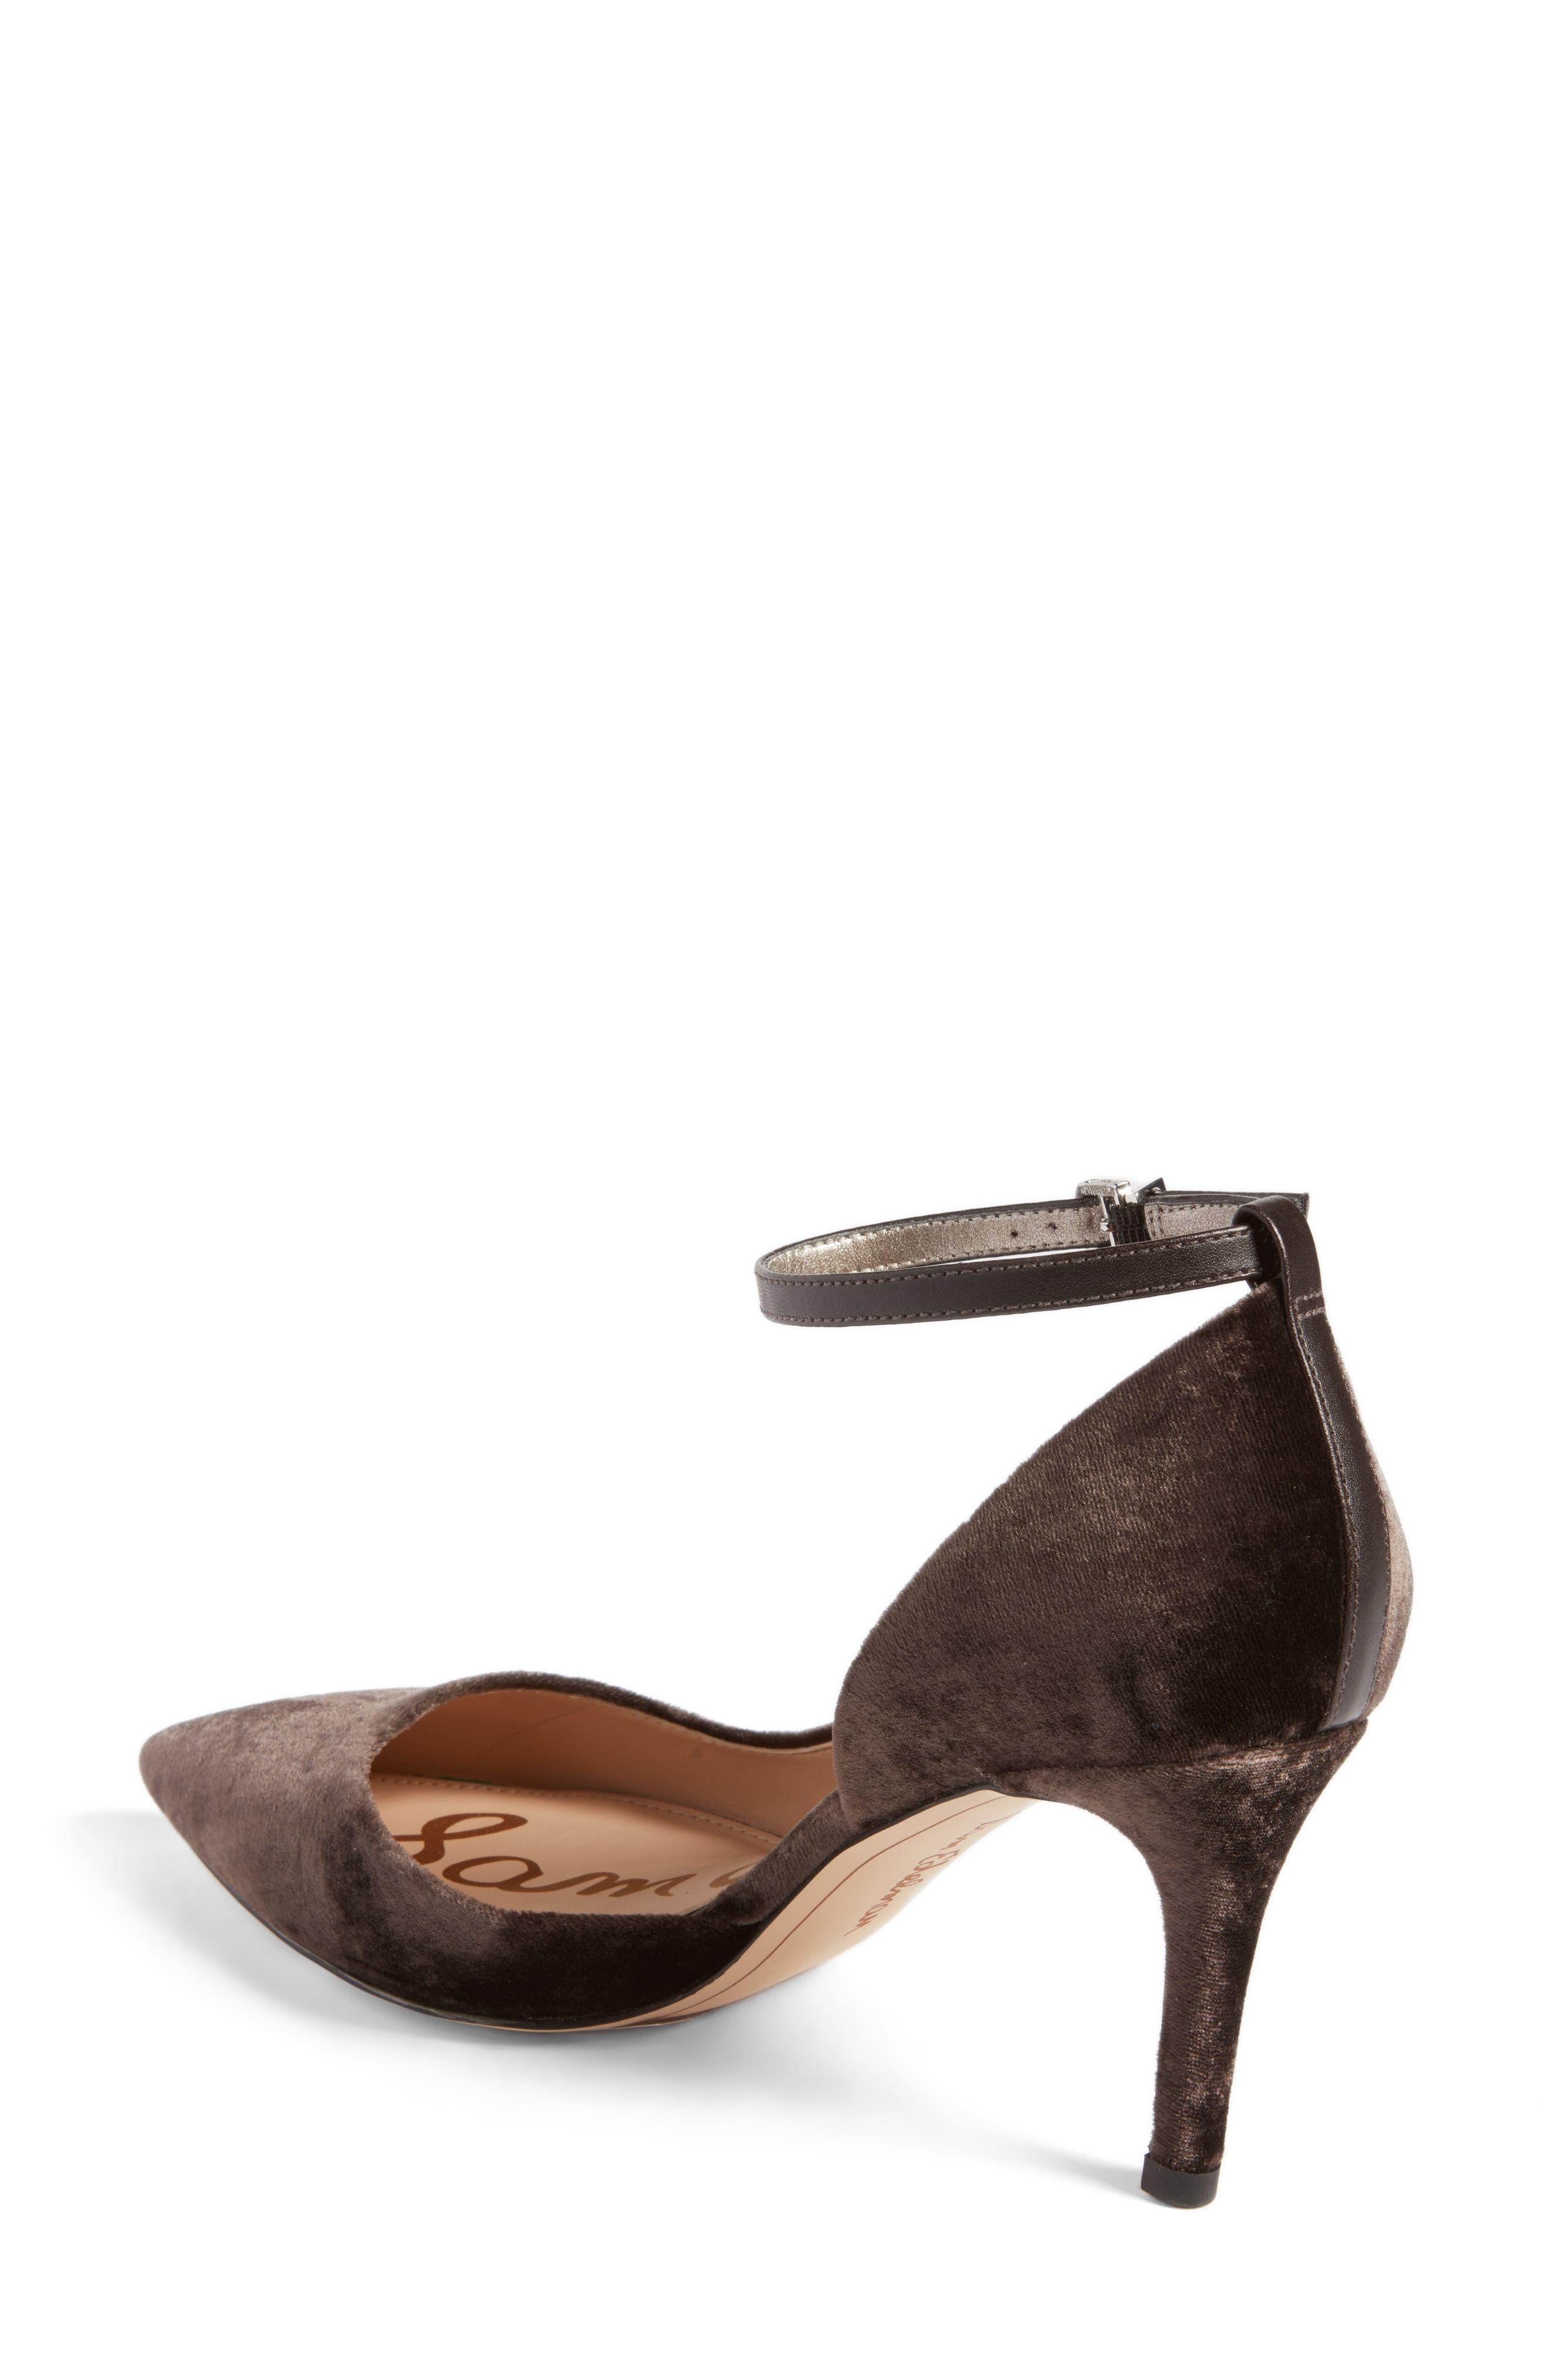 Alternate Image 2  - Sam Edelman Tia Ankle Strap Pump (Women)